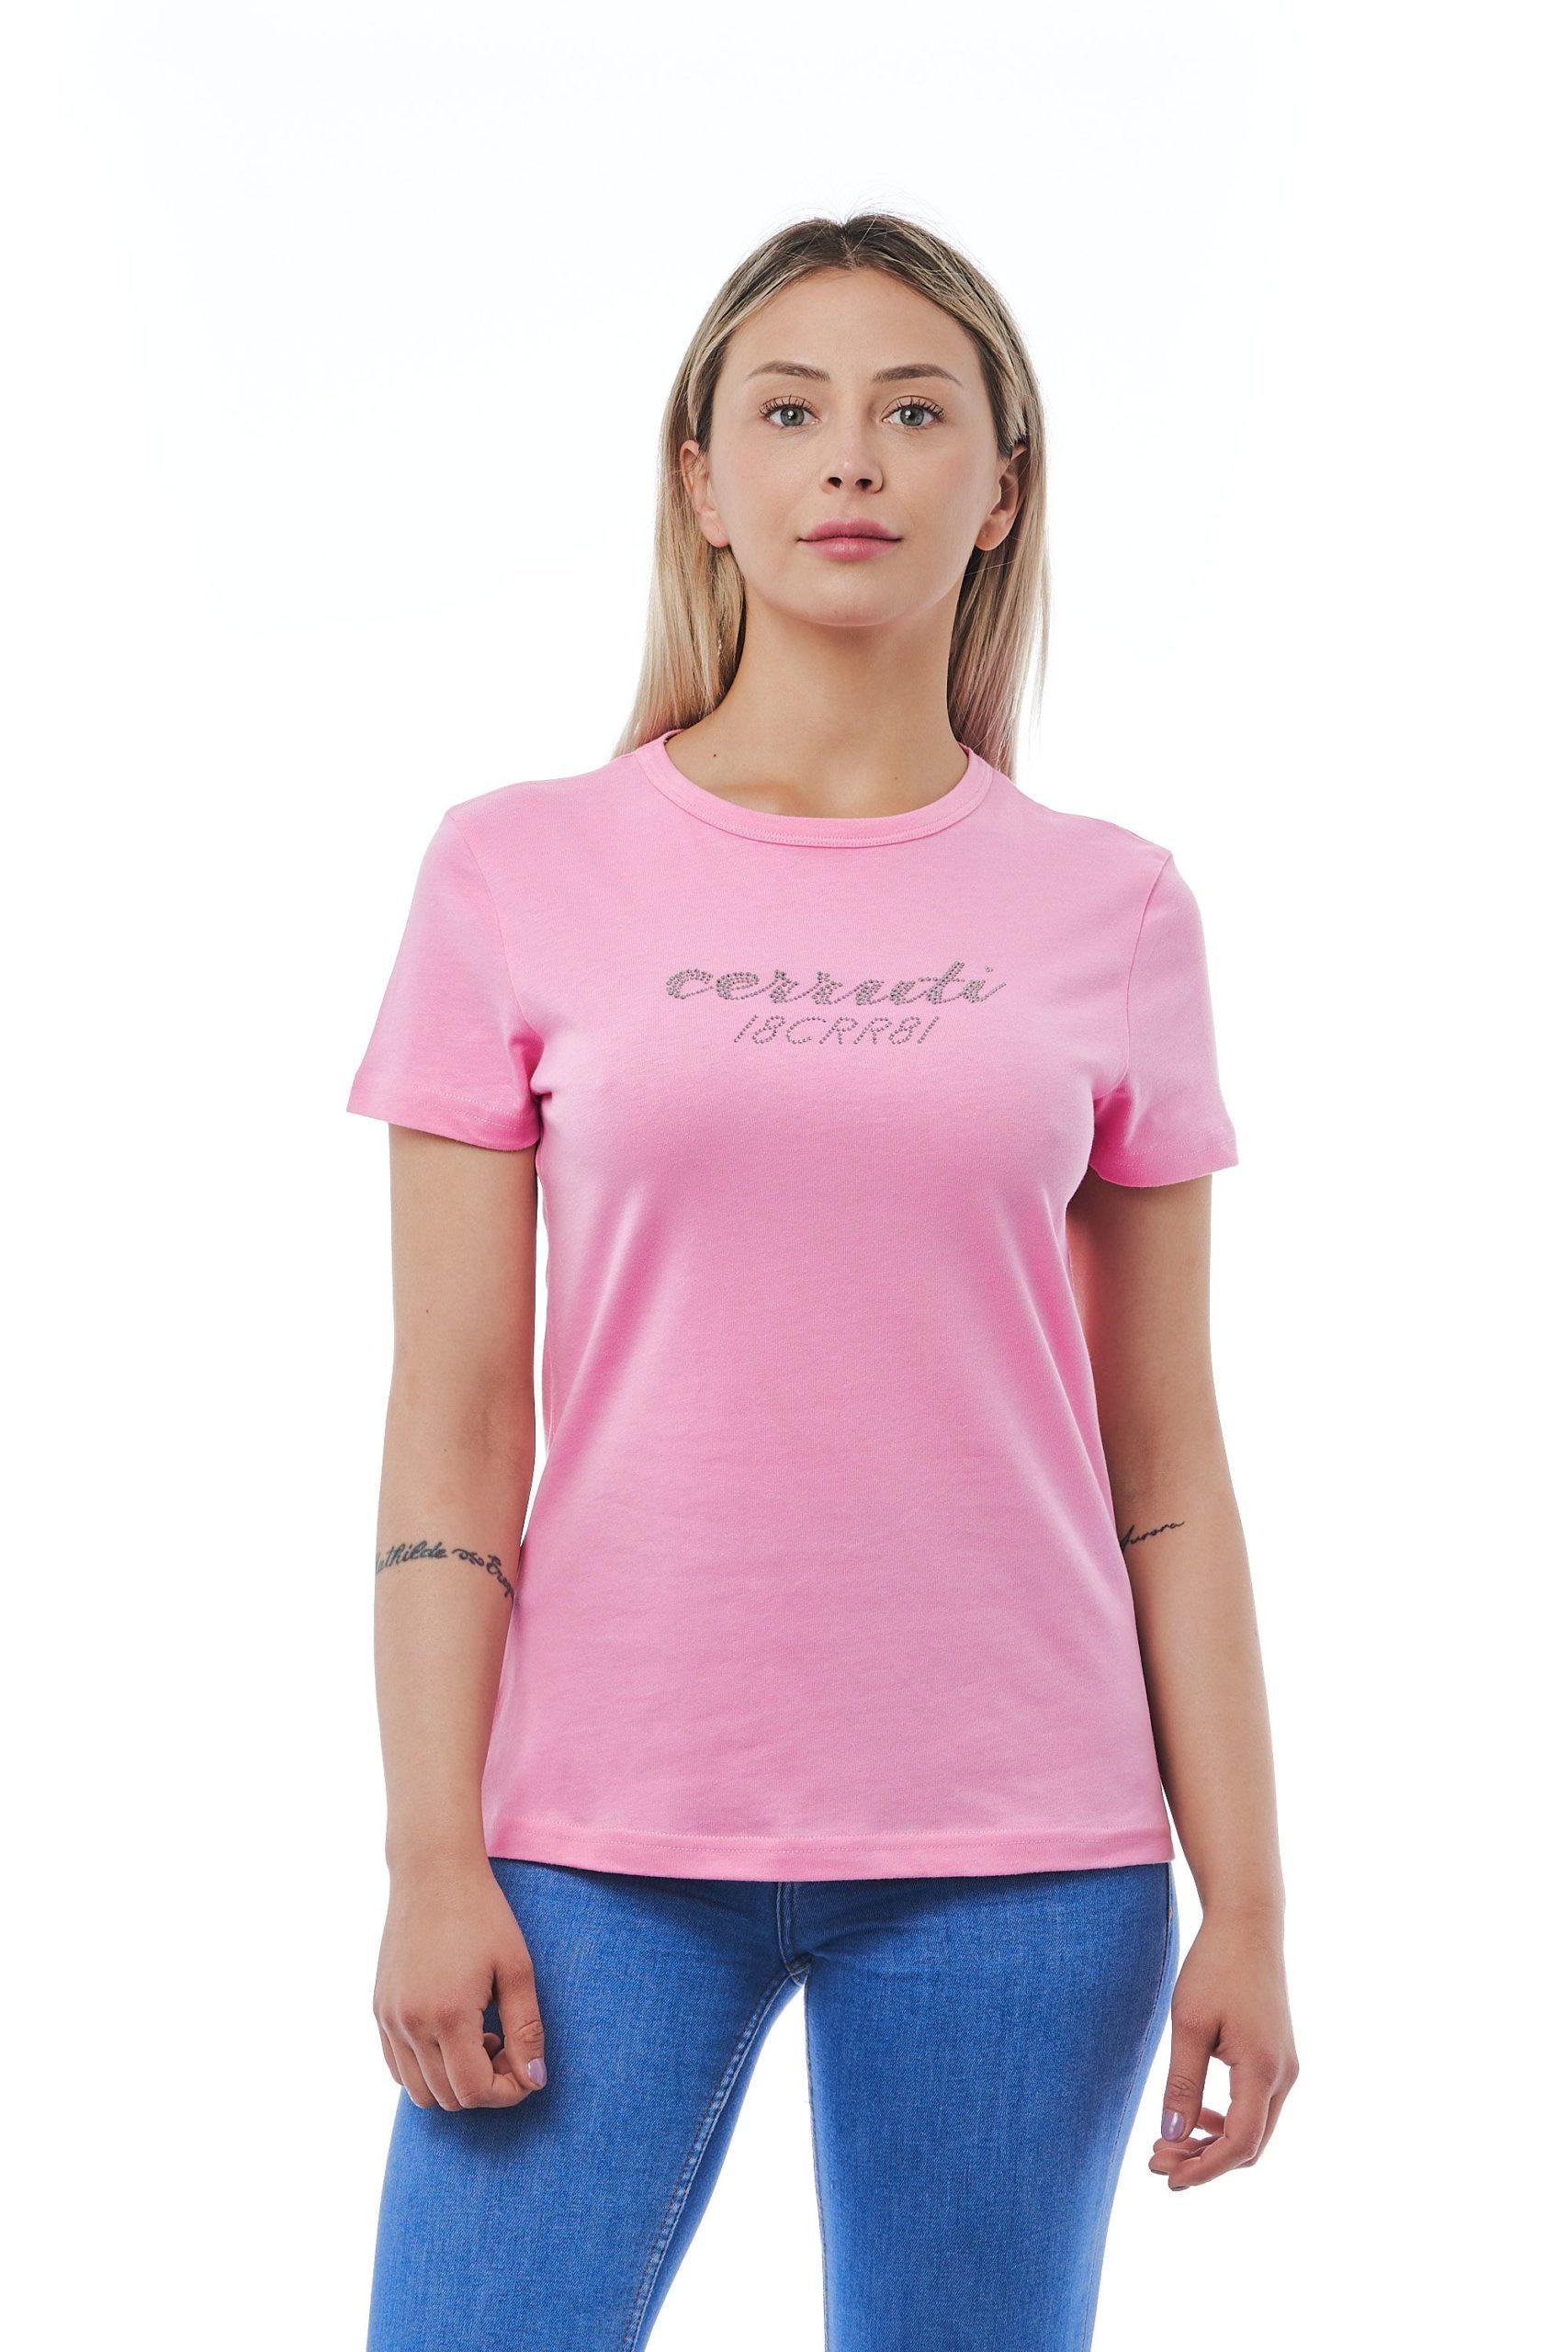 Cerruti 1881 Women's Rosa T-Shirt Pink CE1410228 - M